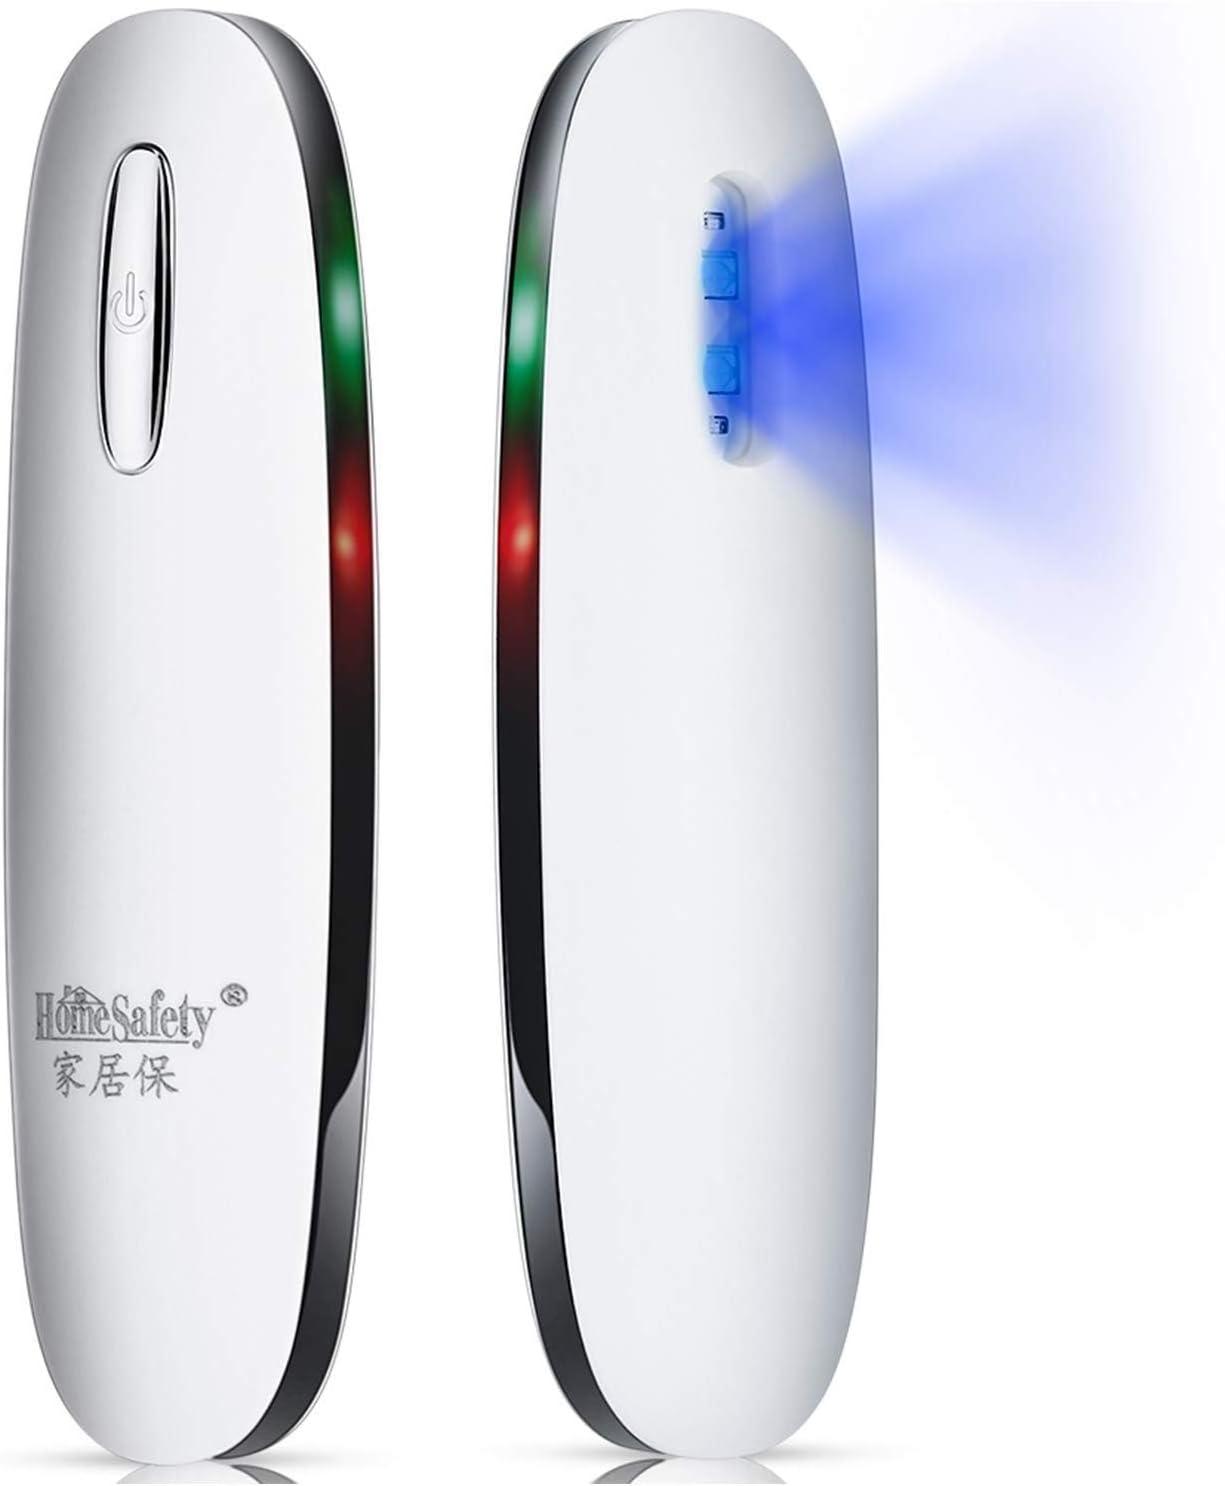 USB Tragbares UV-Lampe Zerst/örung 99/% Mini UV-C Stick f/ür Handy//M/öbel//Kinderspielzeug//Stoff//Toilette//Kosmetik LED tragbarer Reisestick BILLION DUO UV Hand-Held Licht 2STK